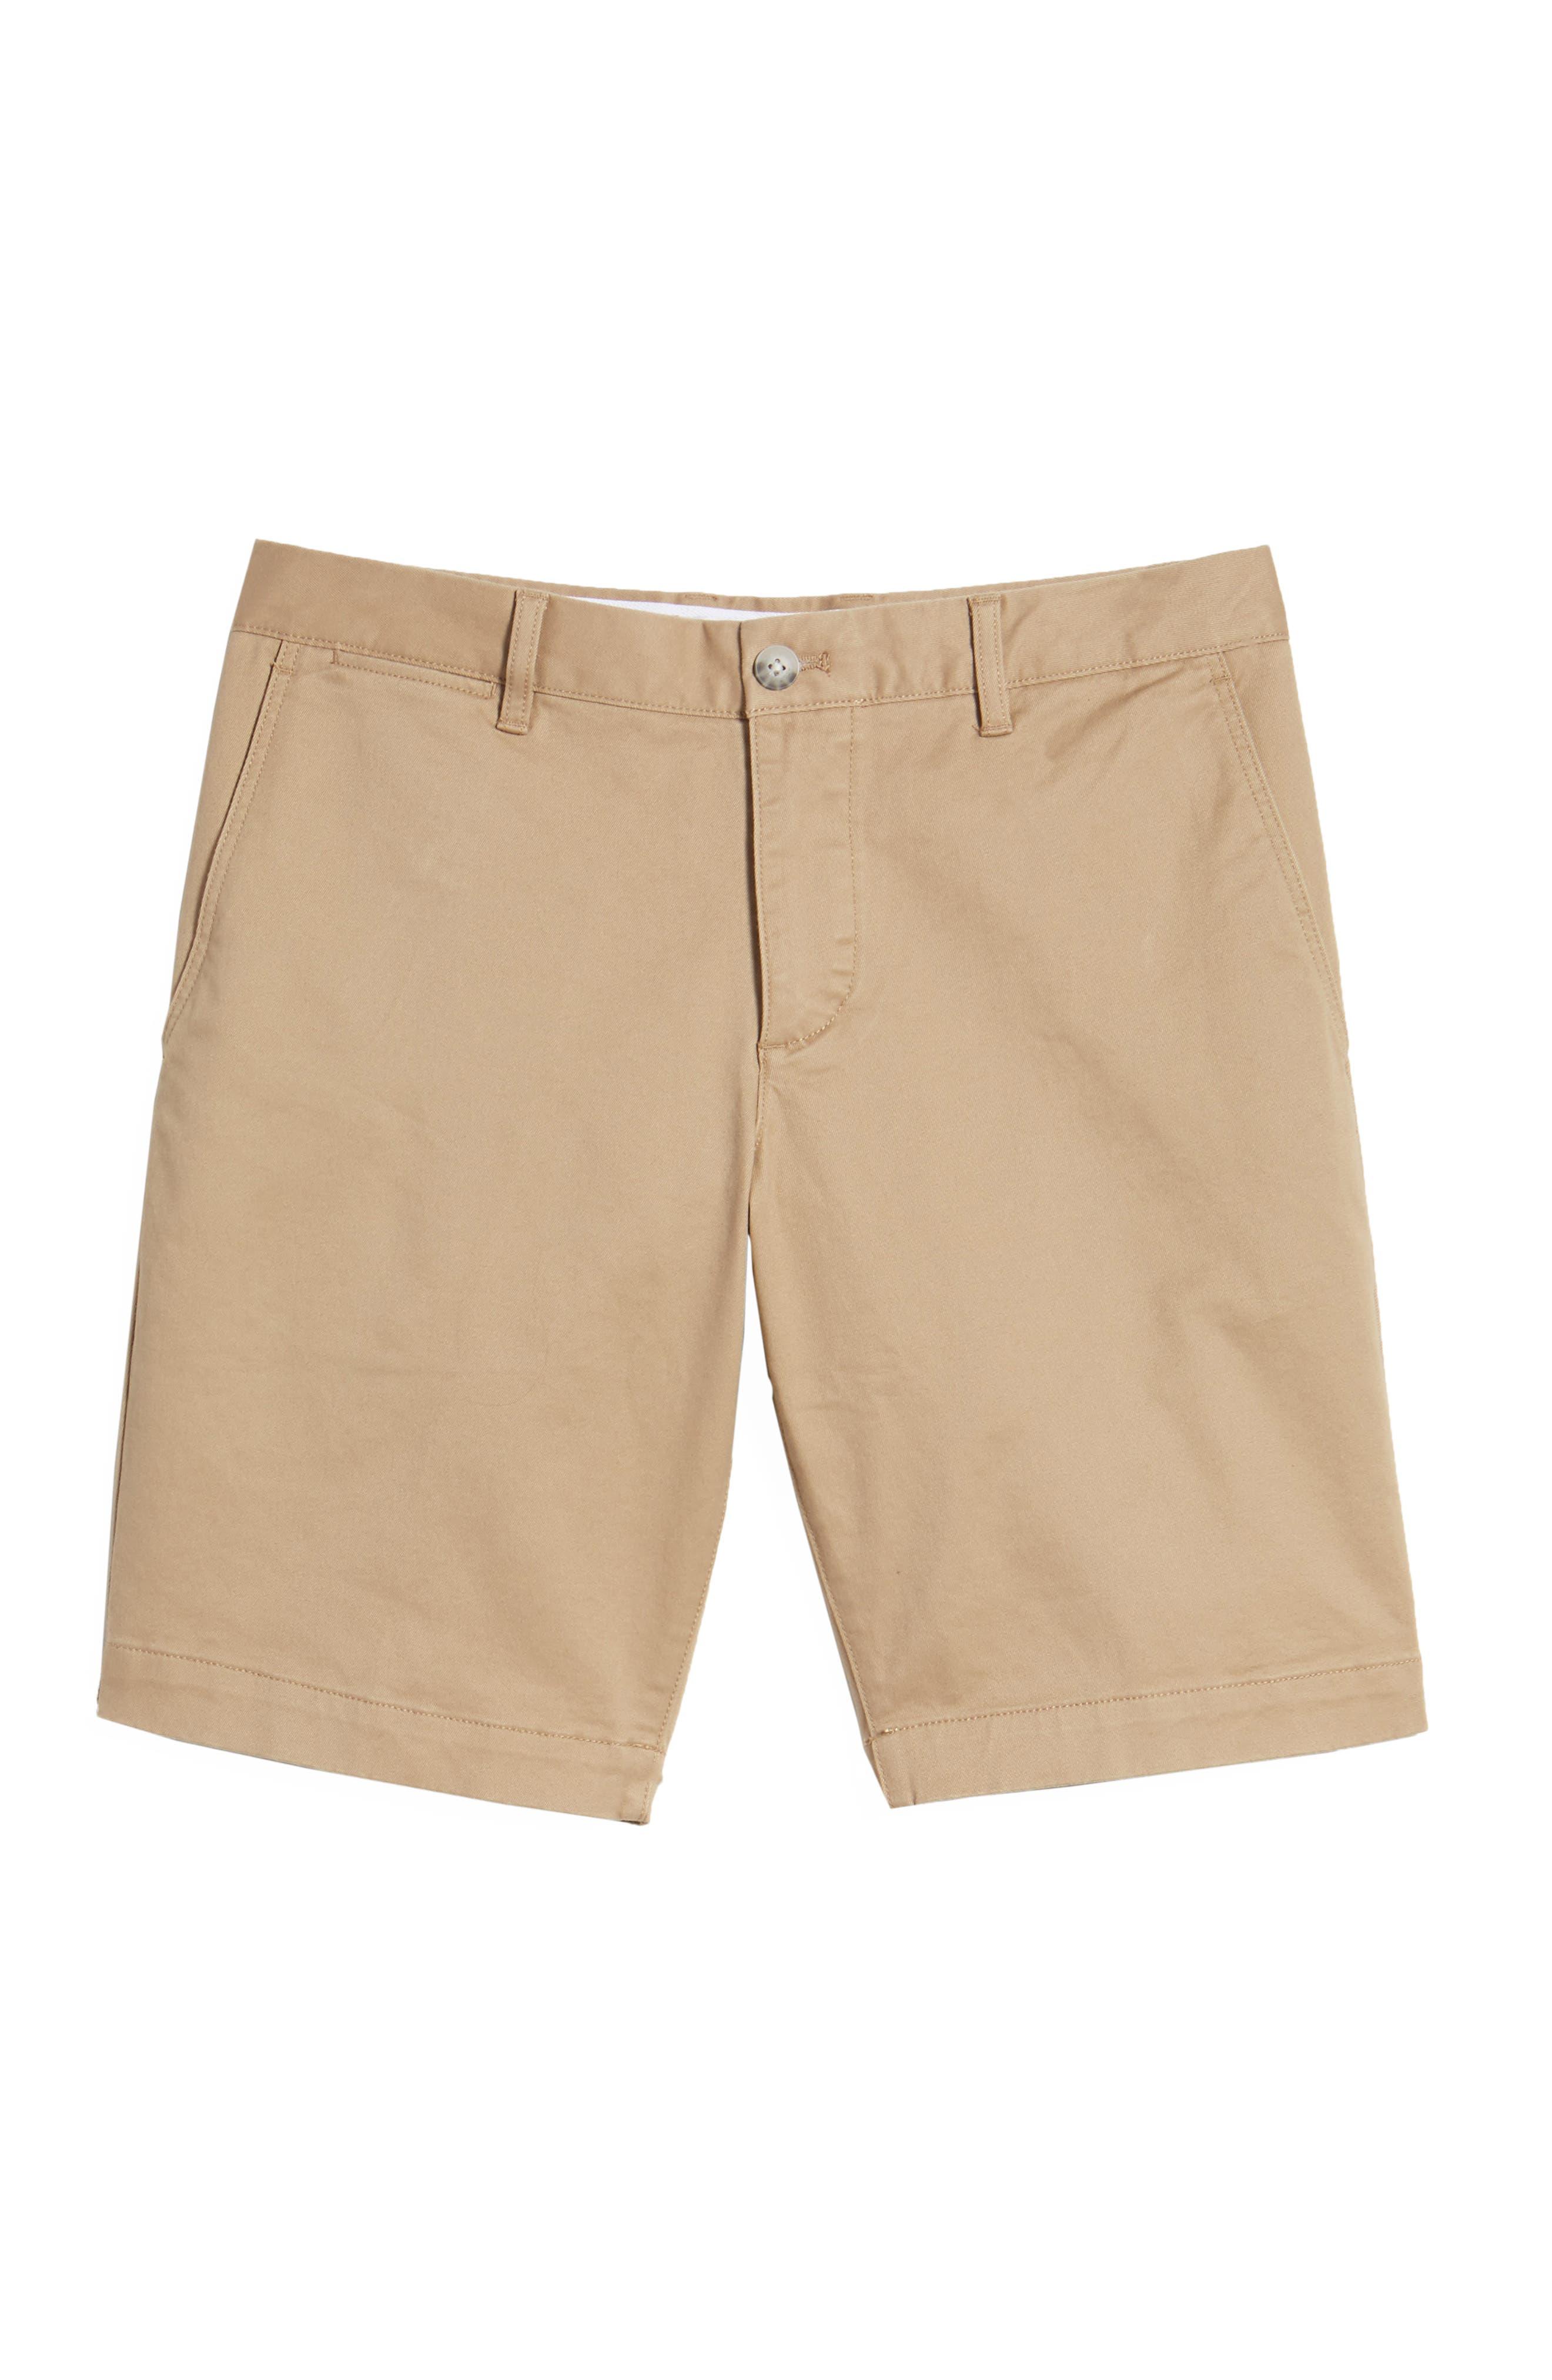 Slim Fit Chino Shorts,                             Alternate thumbnail 6, color,                             Kraft Beige